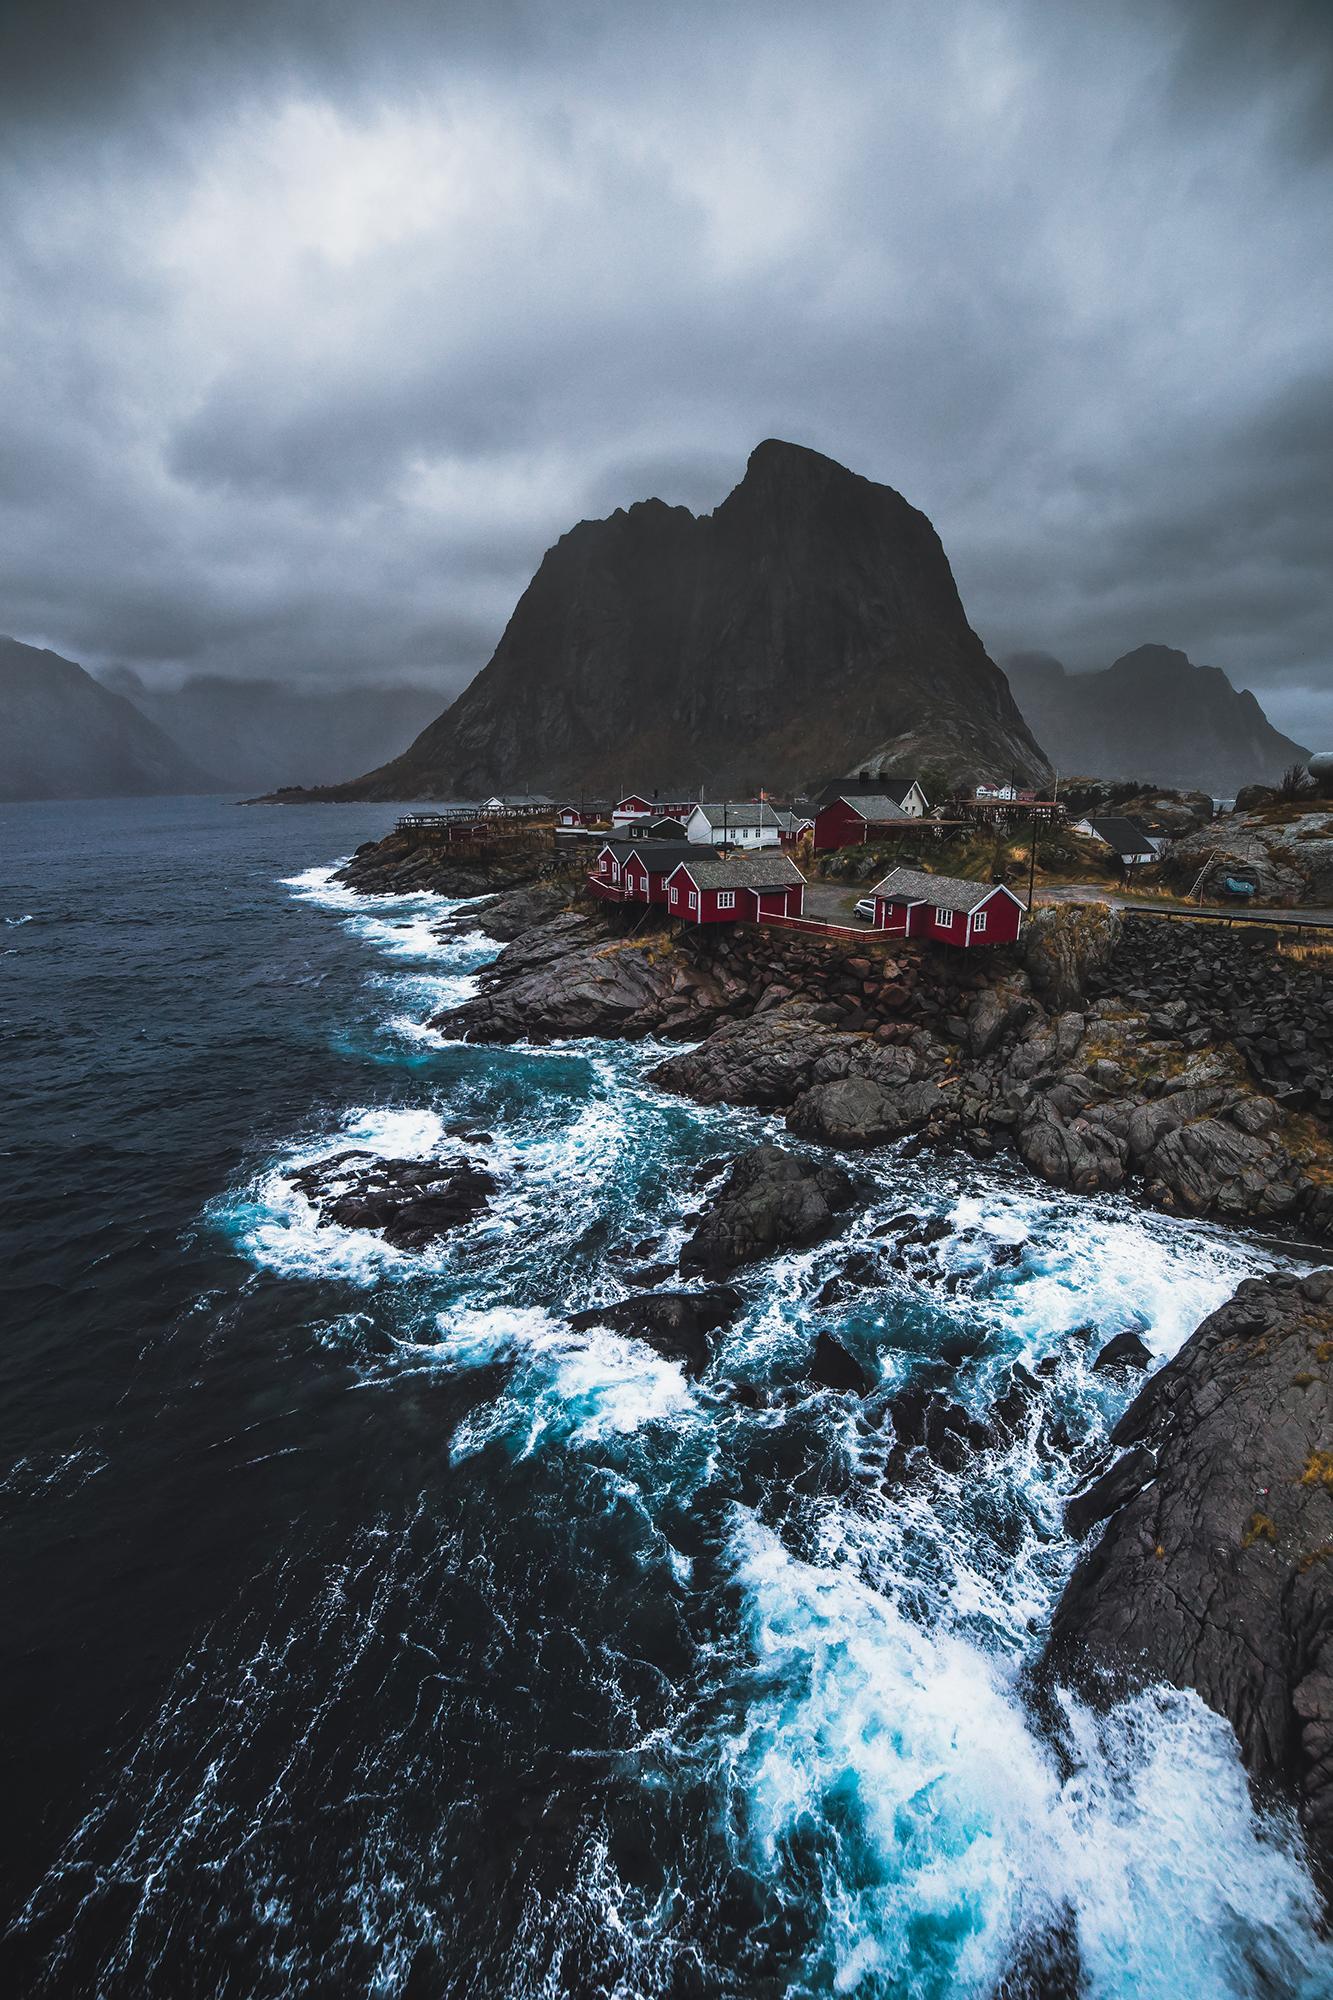 Stormy Hamnøy, Lofoten, October 2016